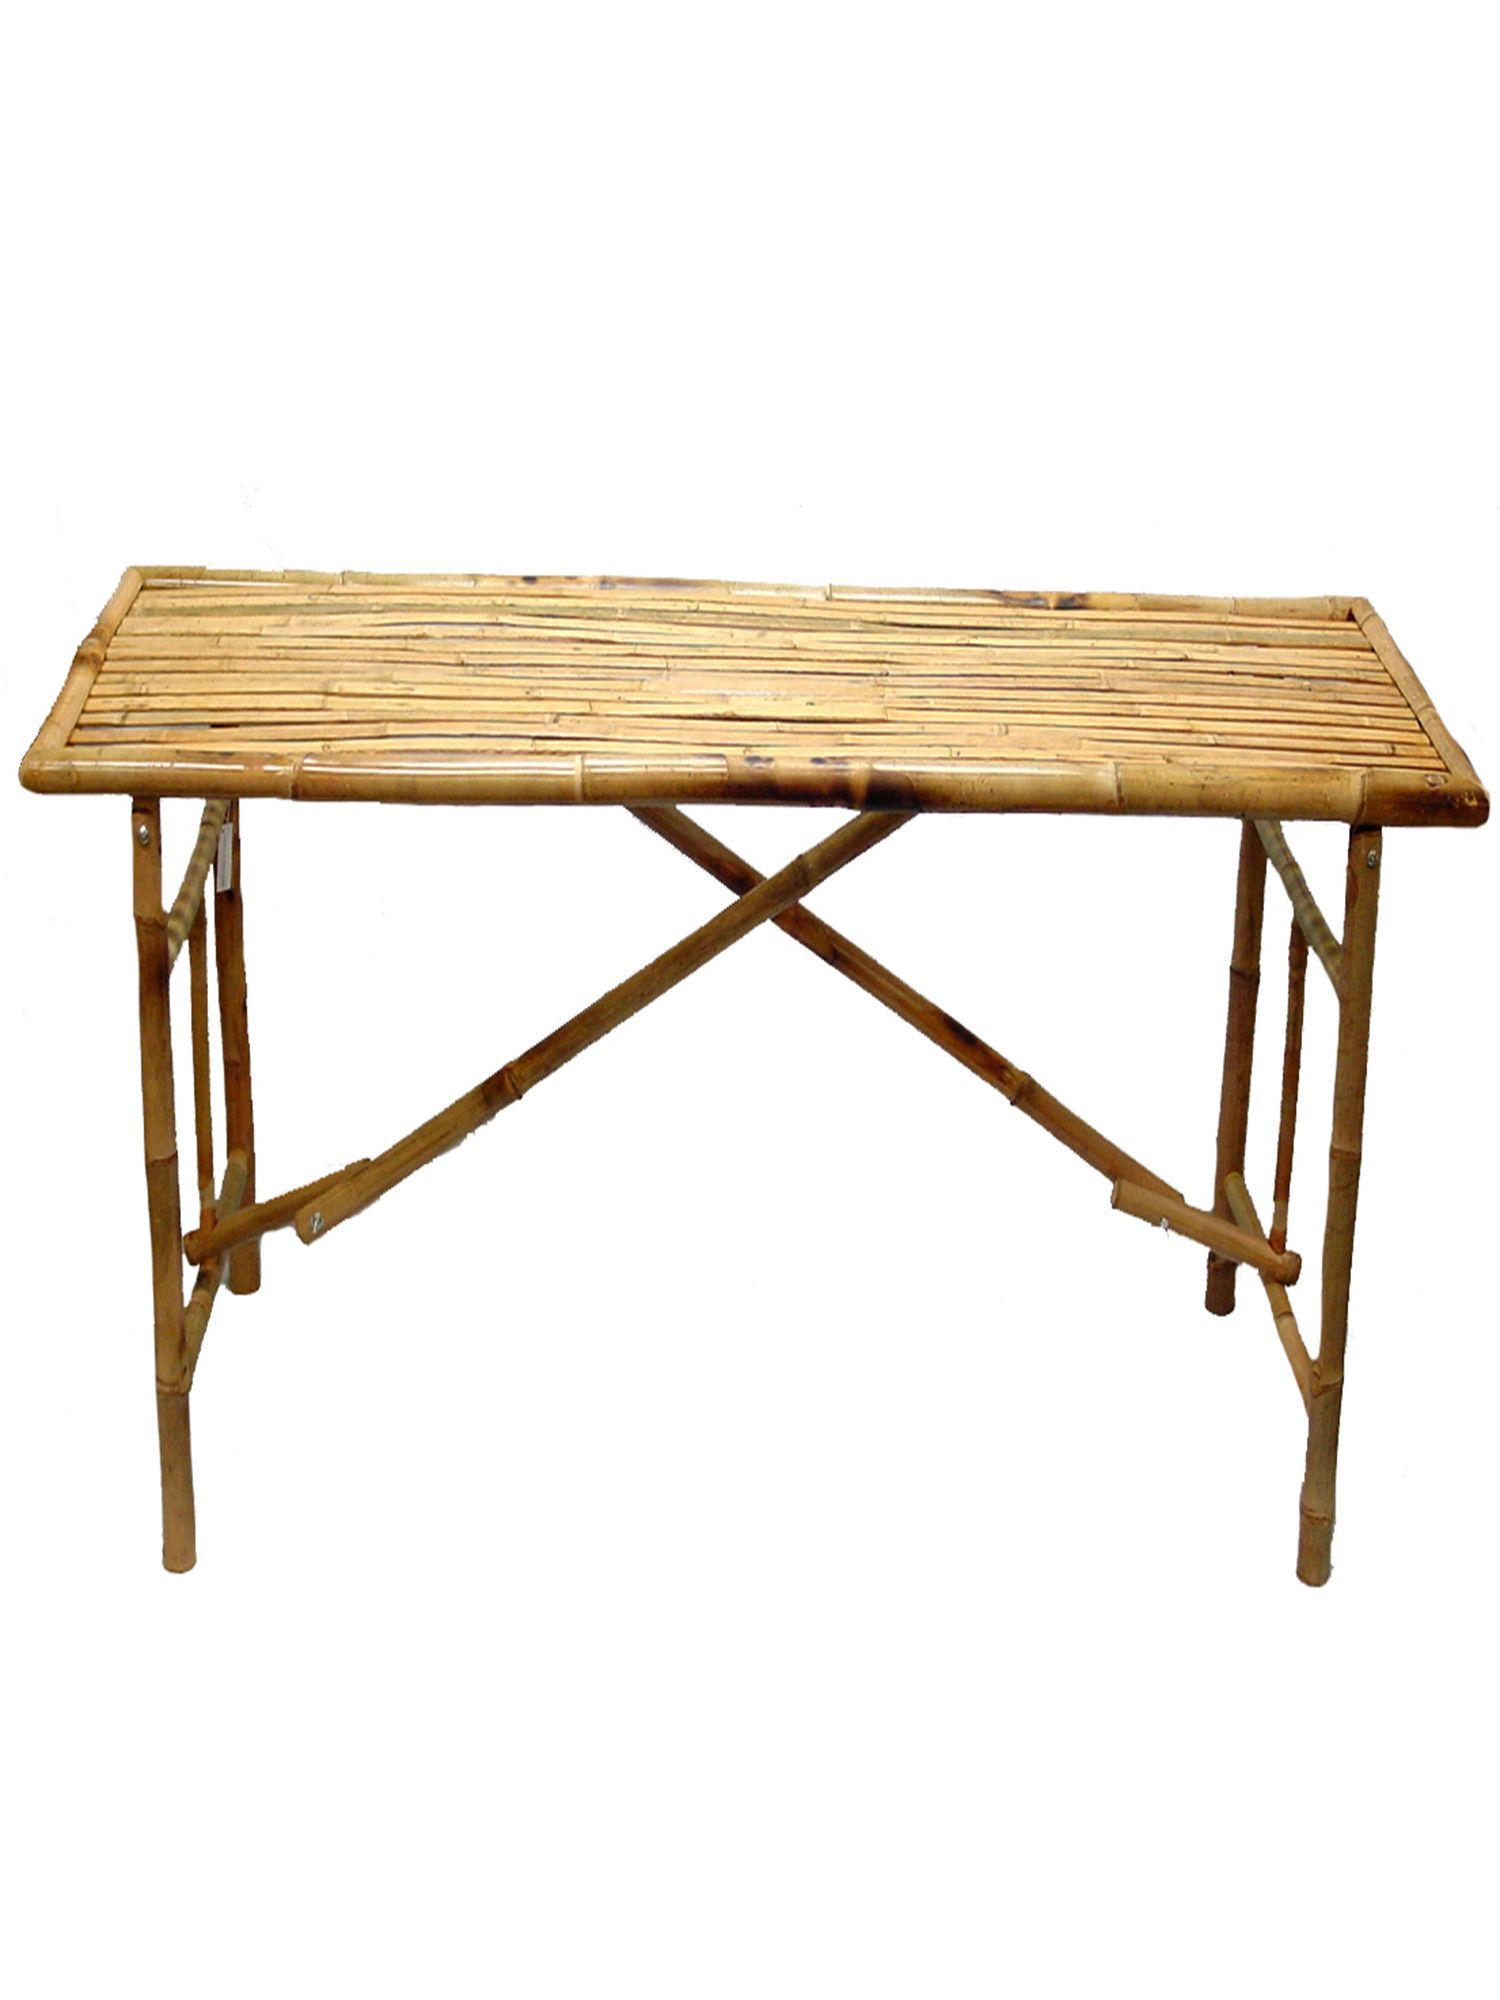 Bamboo Folding Table Vietnam